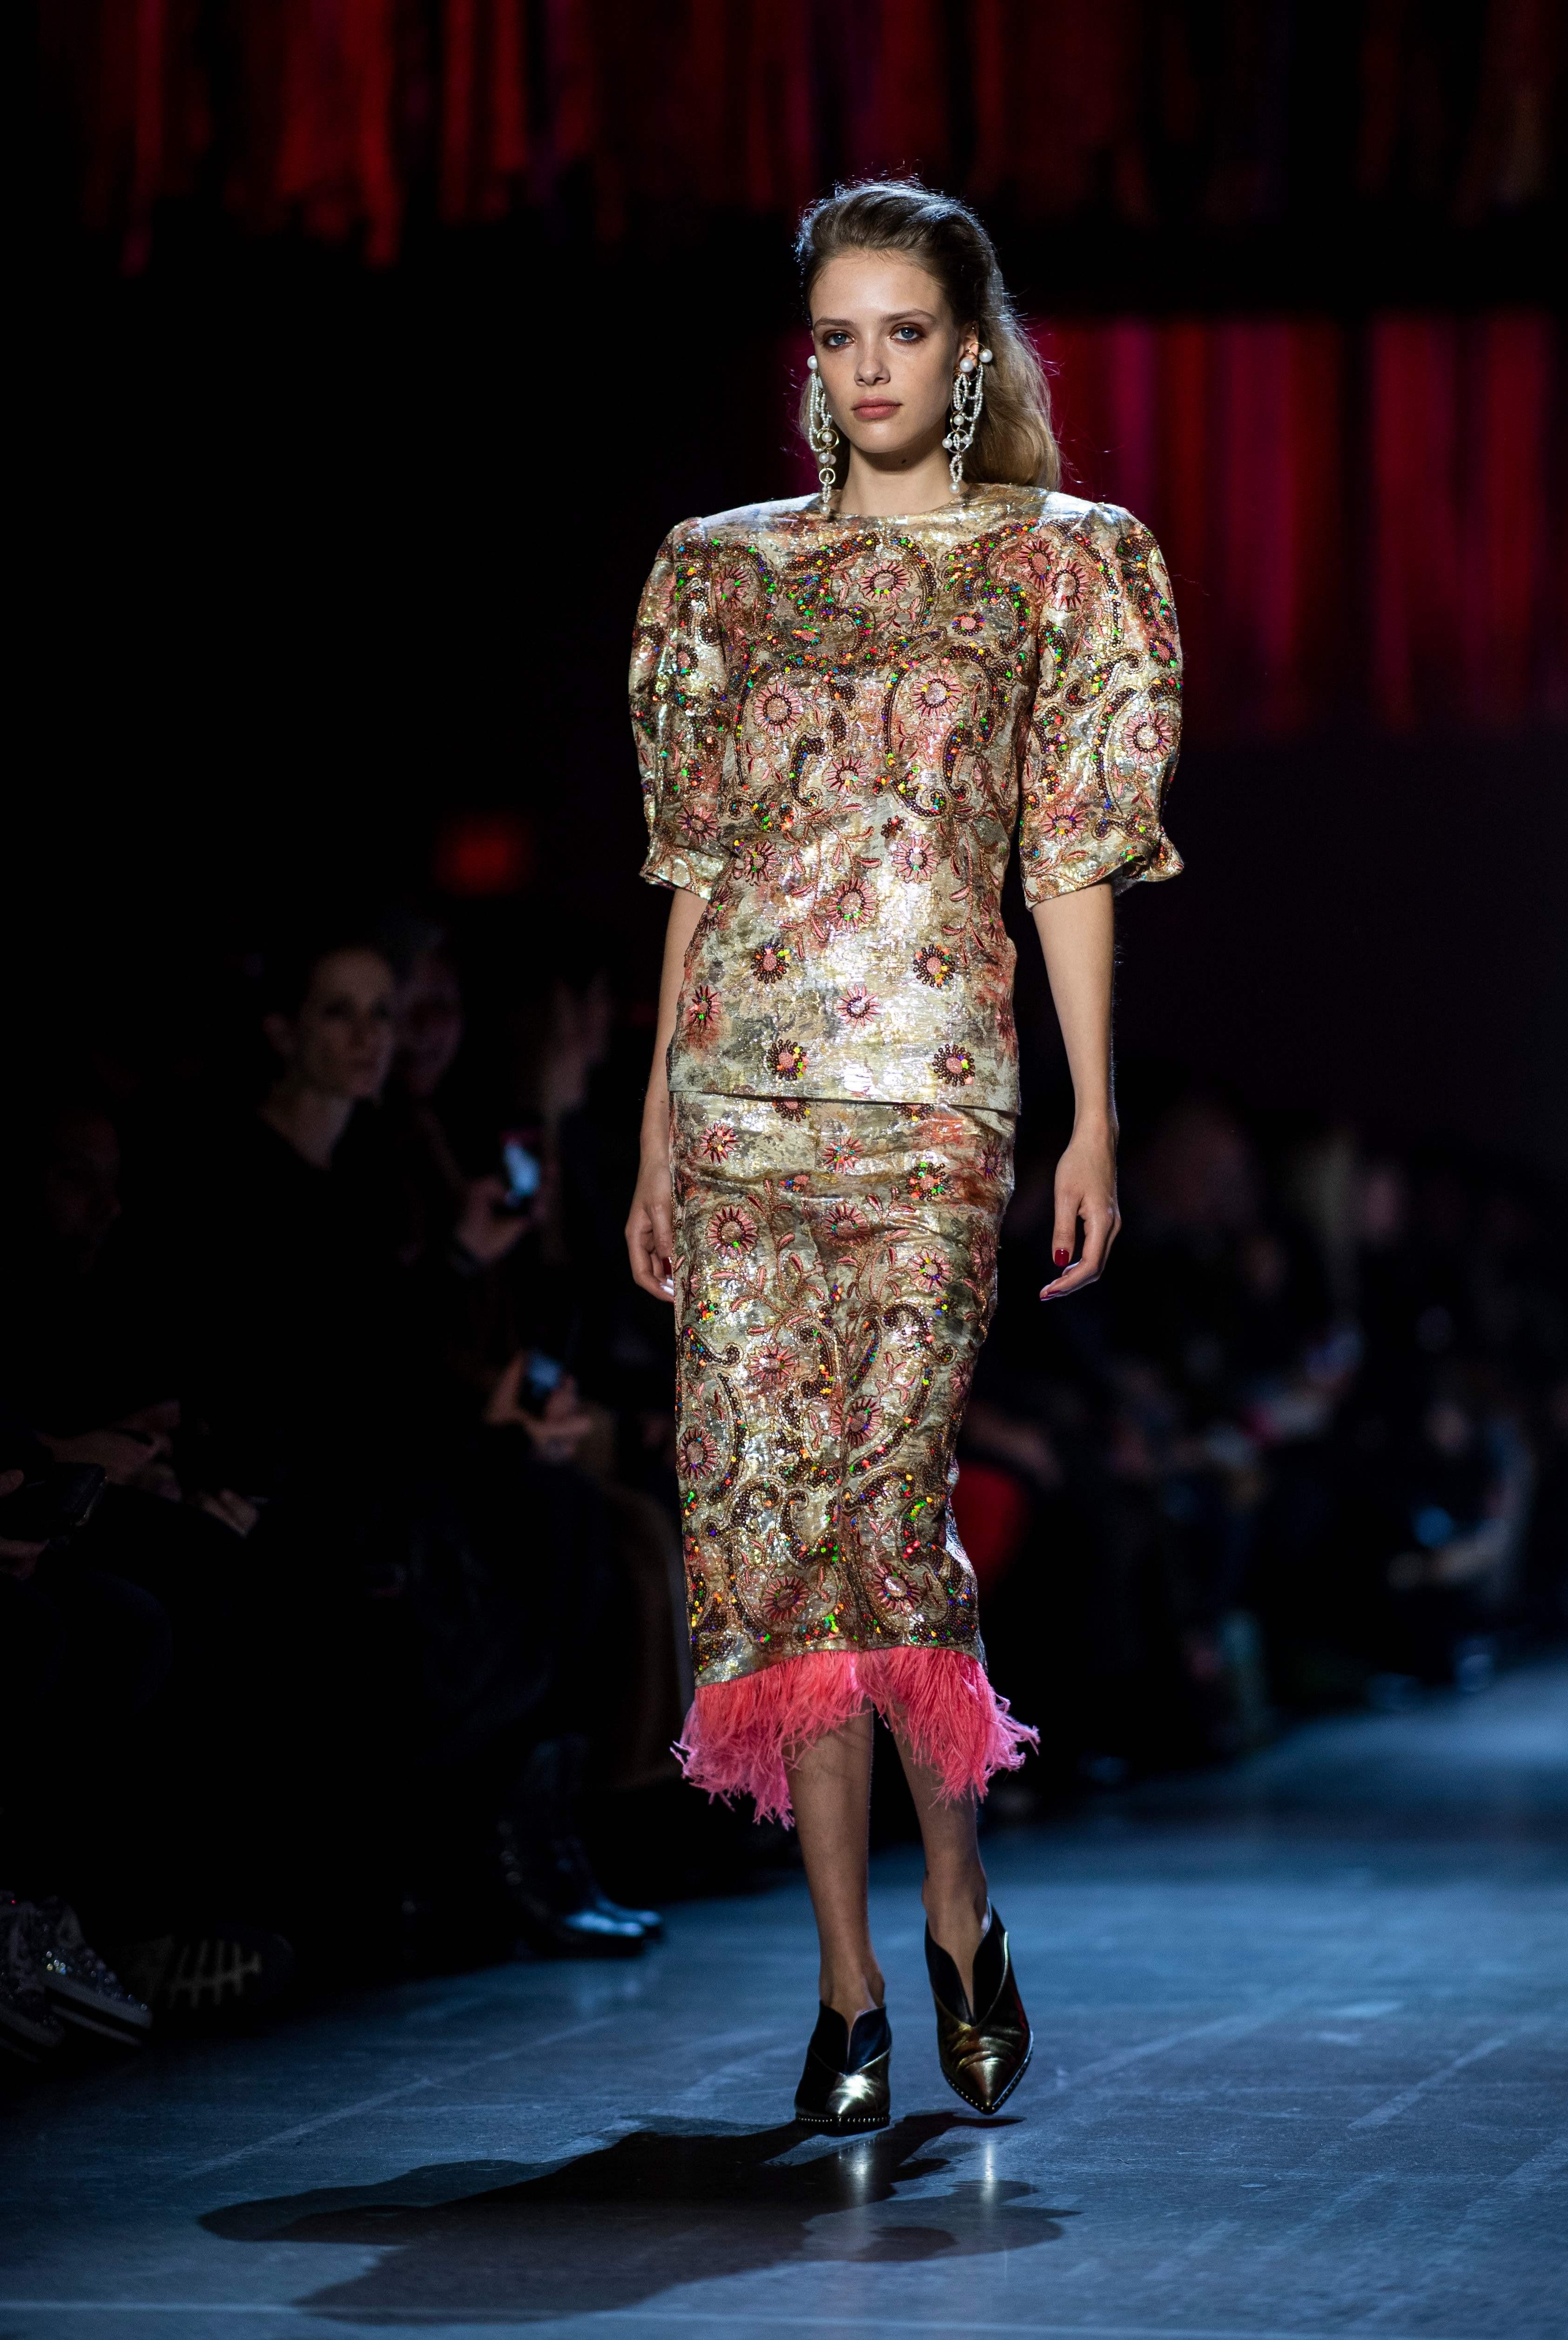 126311b95da New York Fashion Week  Prabal Gurung and Christian Siriano find inspiration  in Nepal and diversity